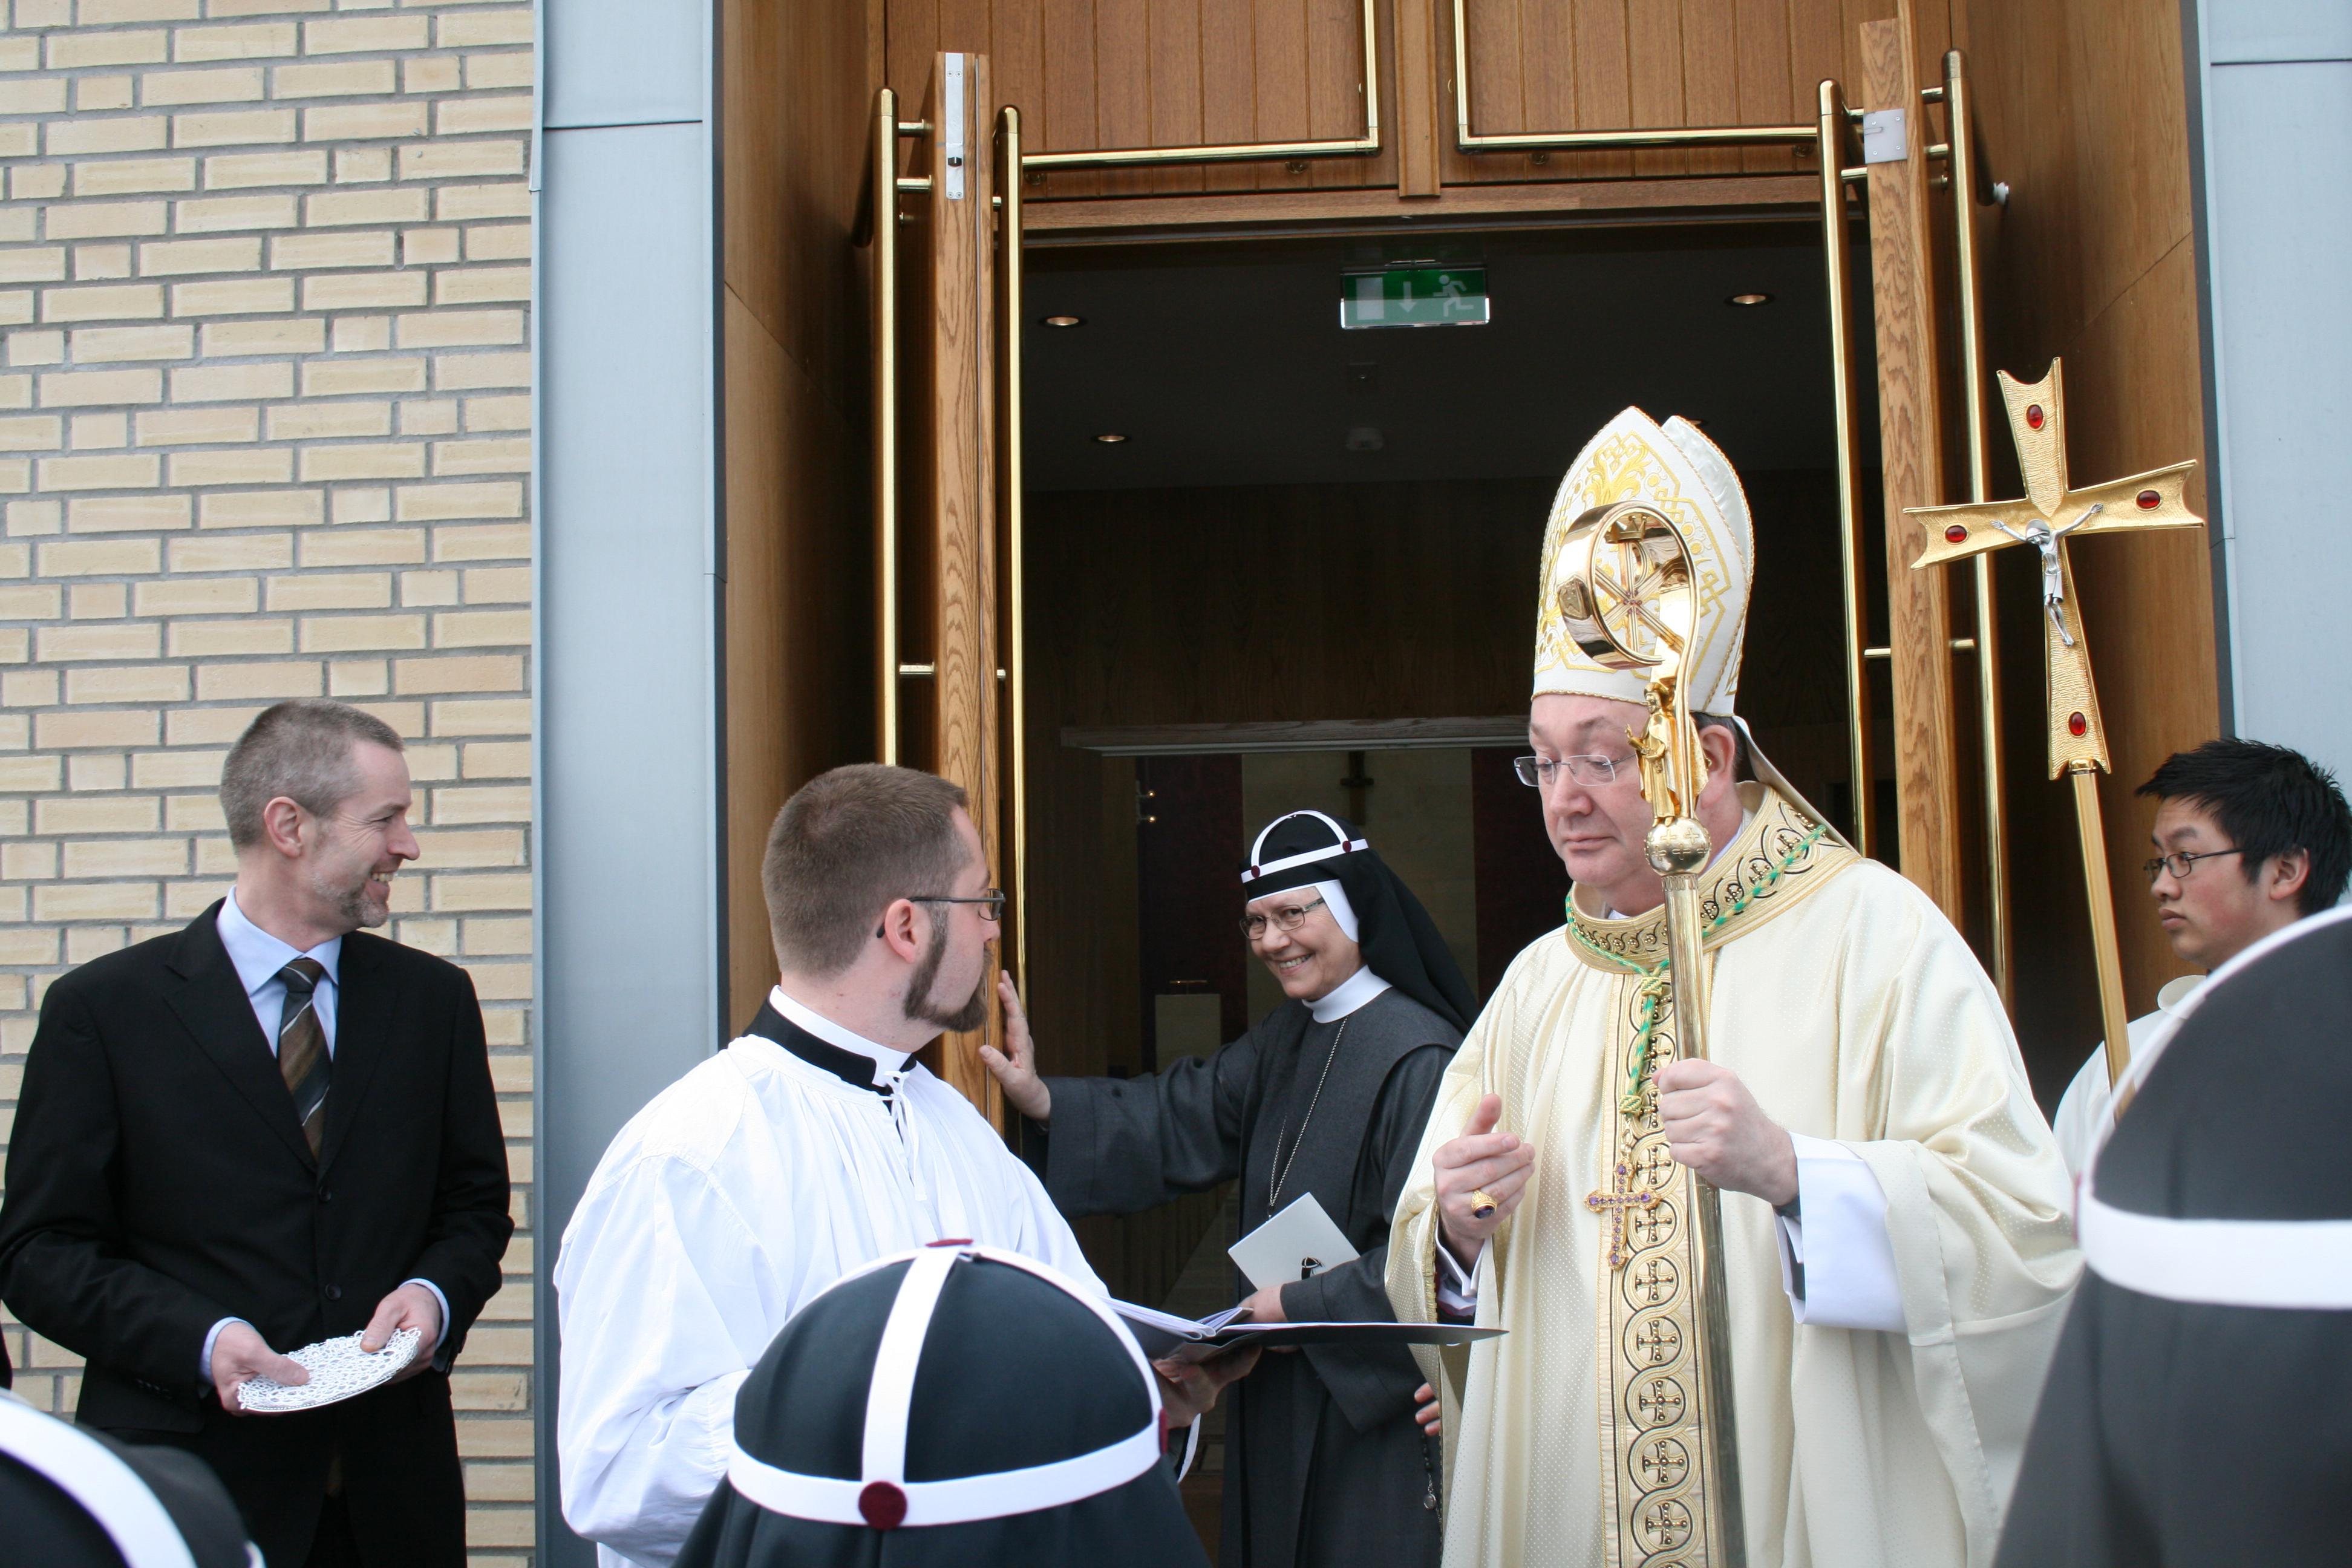 Fra venstre: Arkitekt Lars Meland, pater Fredrik Hansen, moder Tekla Famiglietti og biskop Bernt Eidsvig.